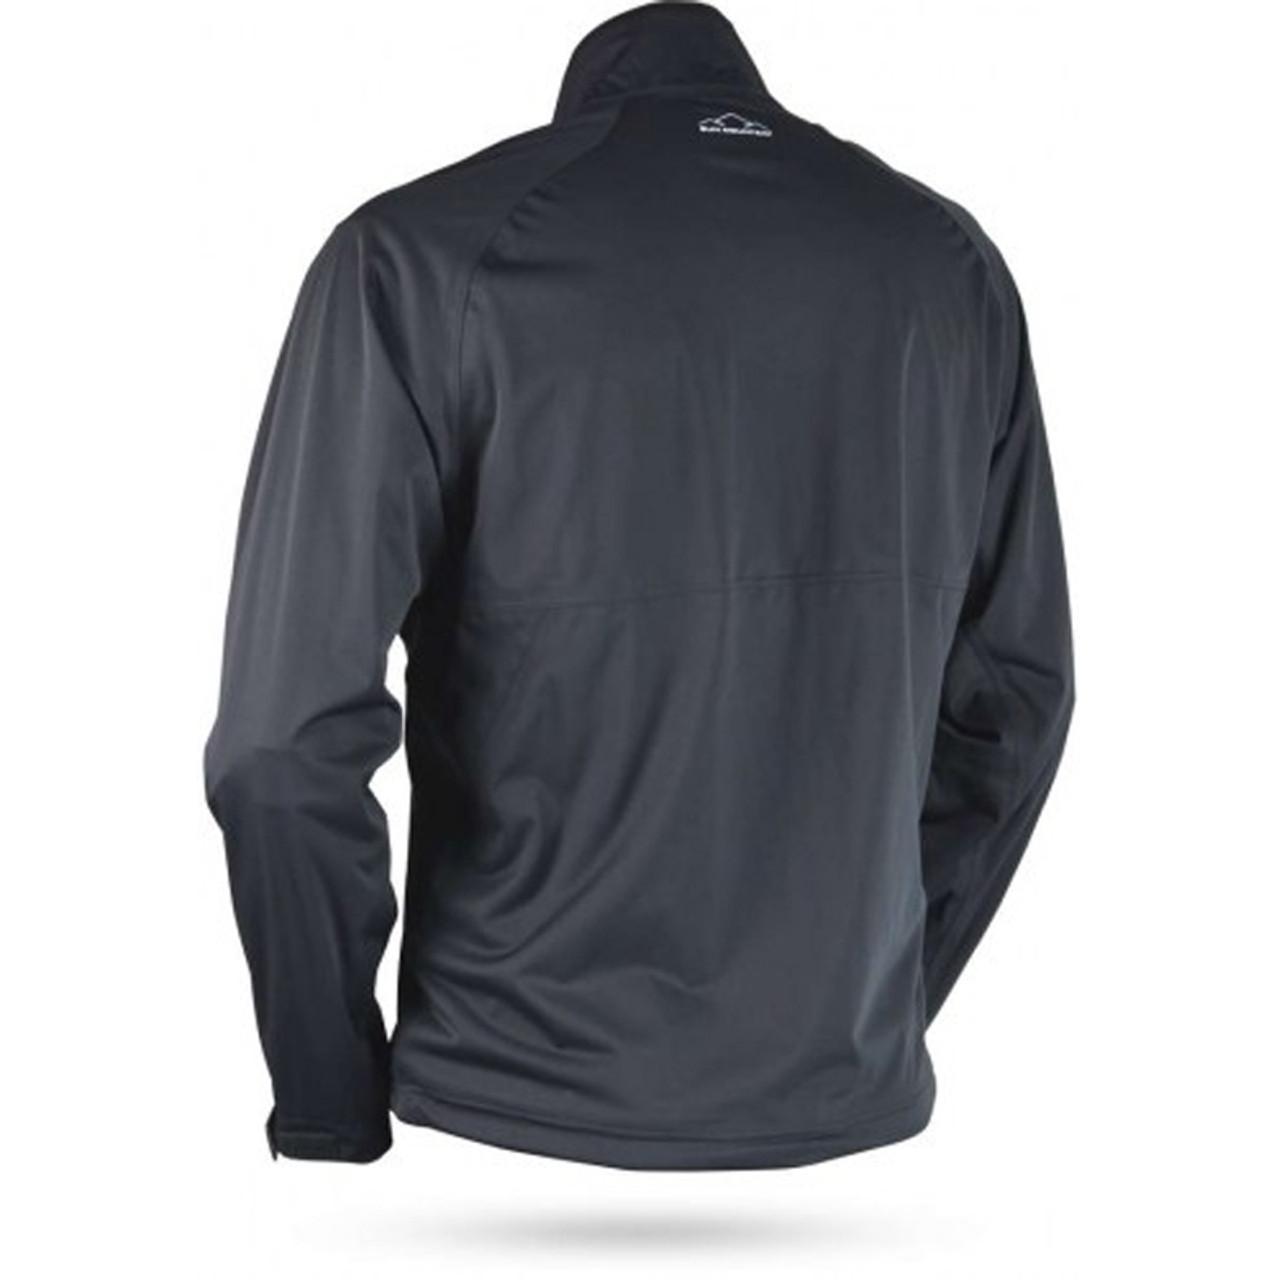 Sun Mountain RainFlex Elite Jacket - Black